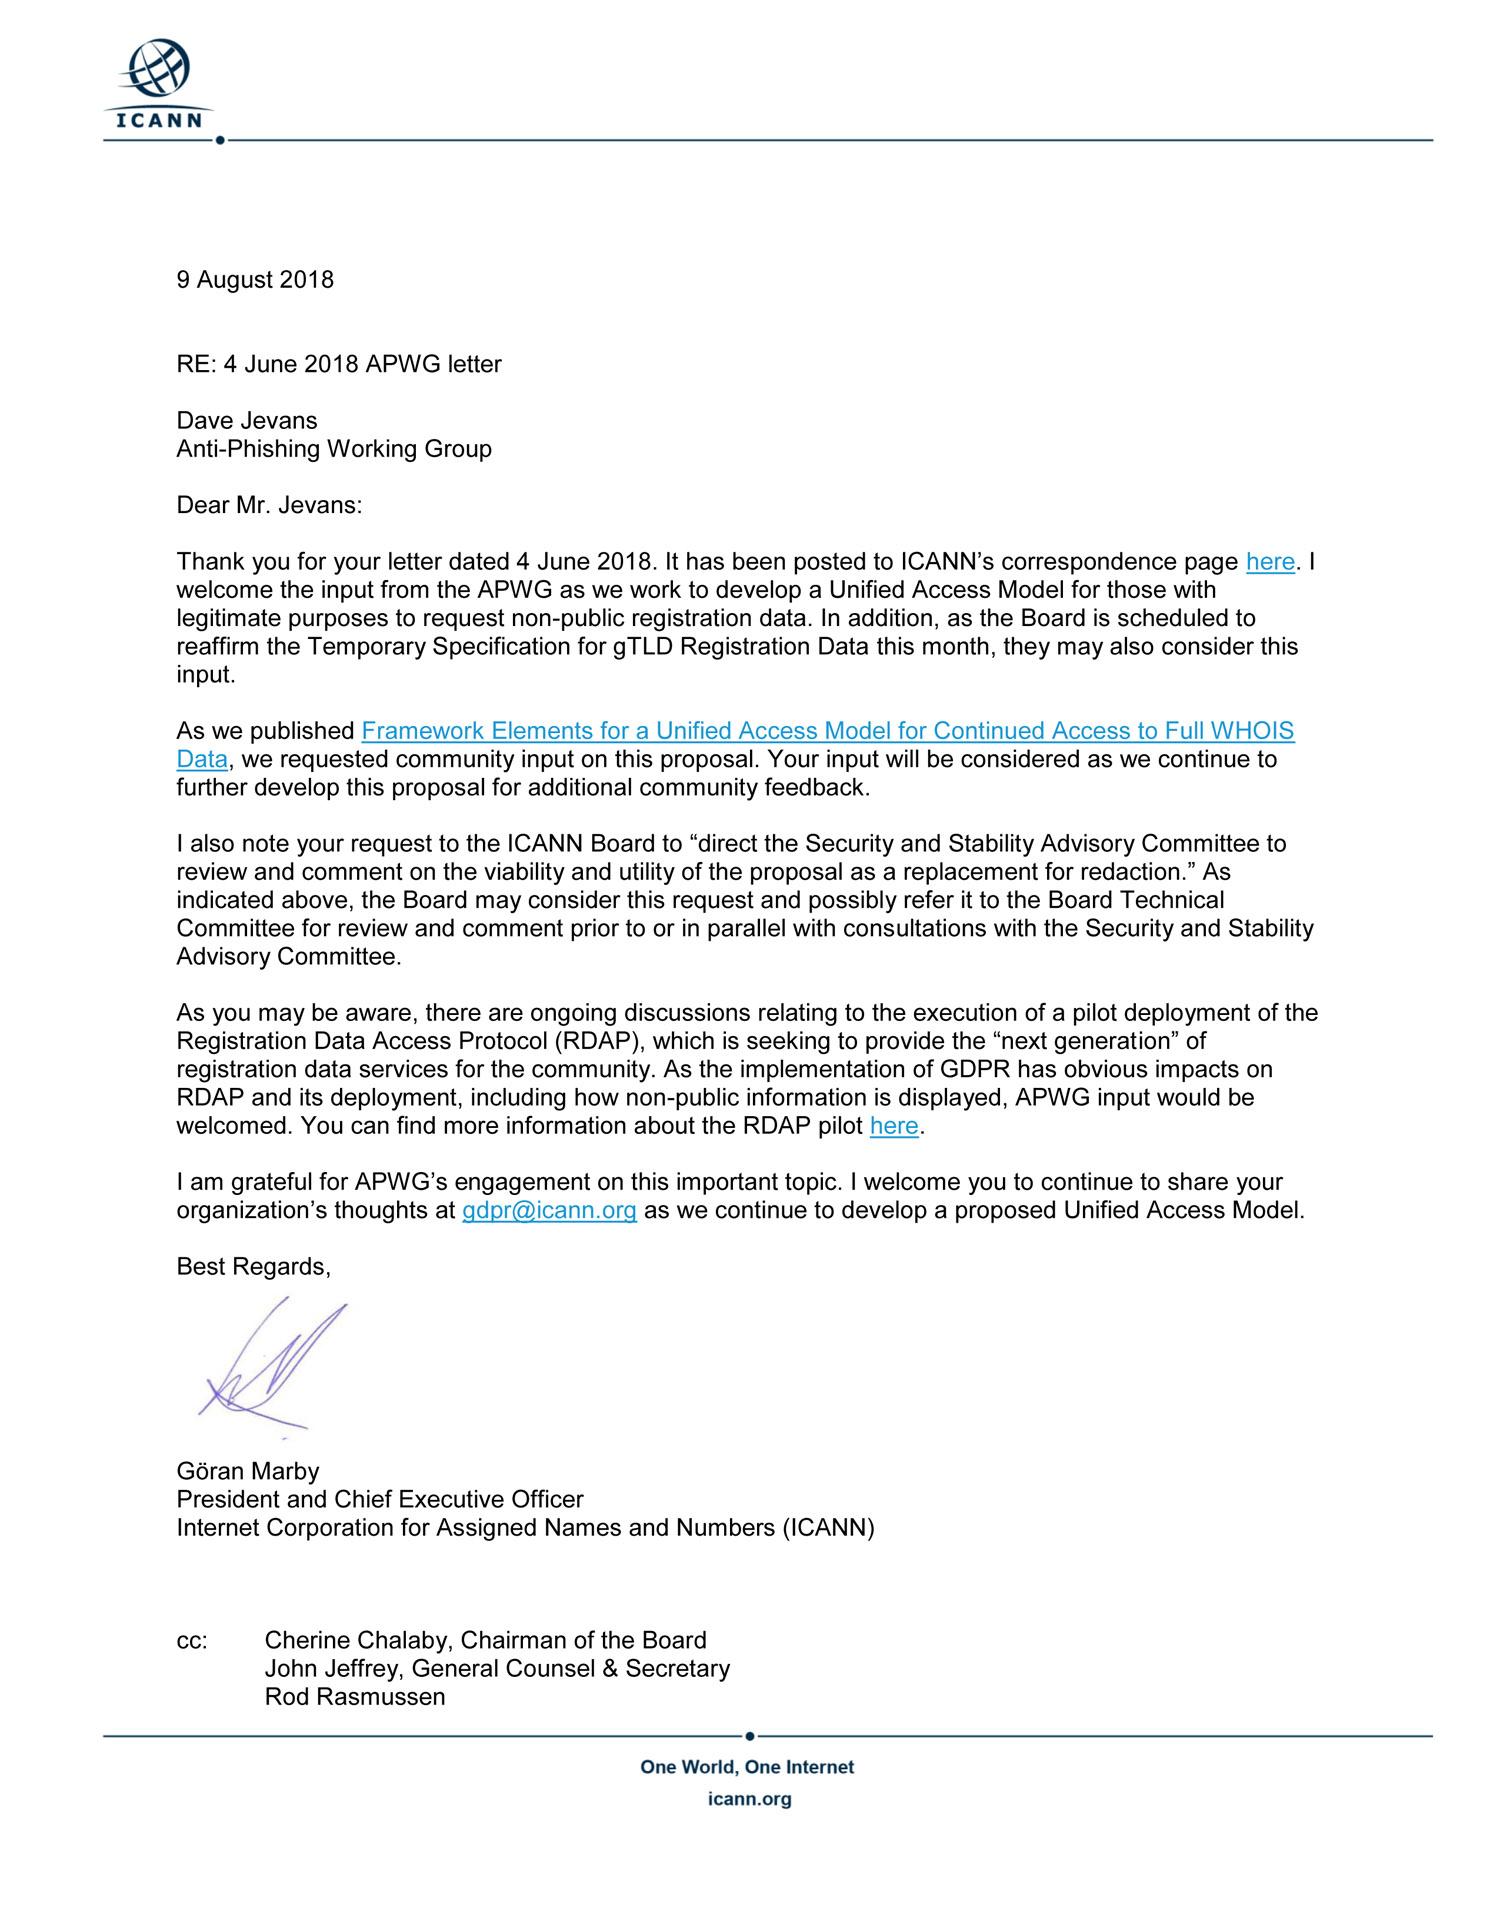 ICANN Response